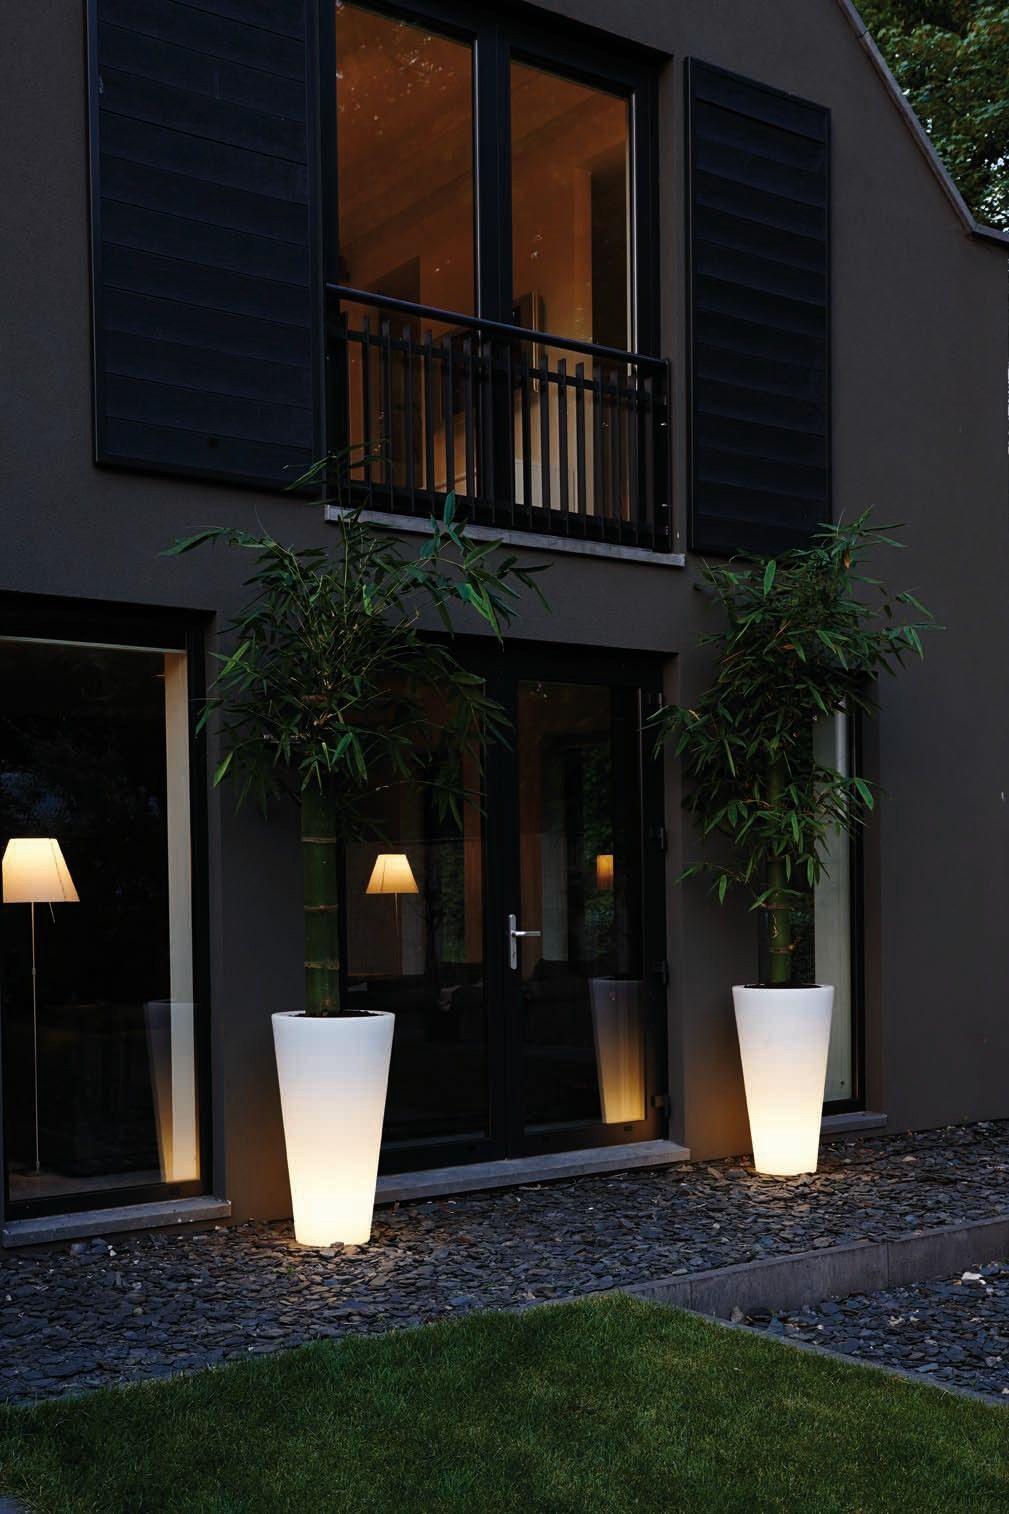 Beautiful Lighting Outdoor With Pure Straight High Led Light Elho Pot Pure Light Design Outdoor Lighting Outside Lighting Ideas Outdoor Kitchen Lighting